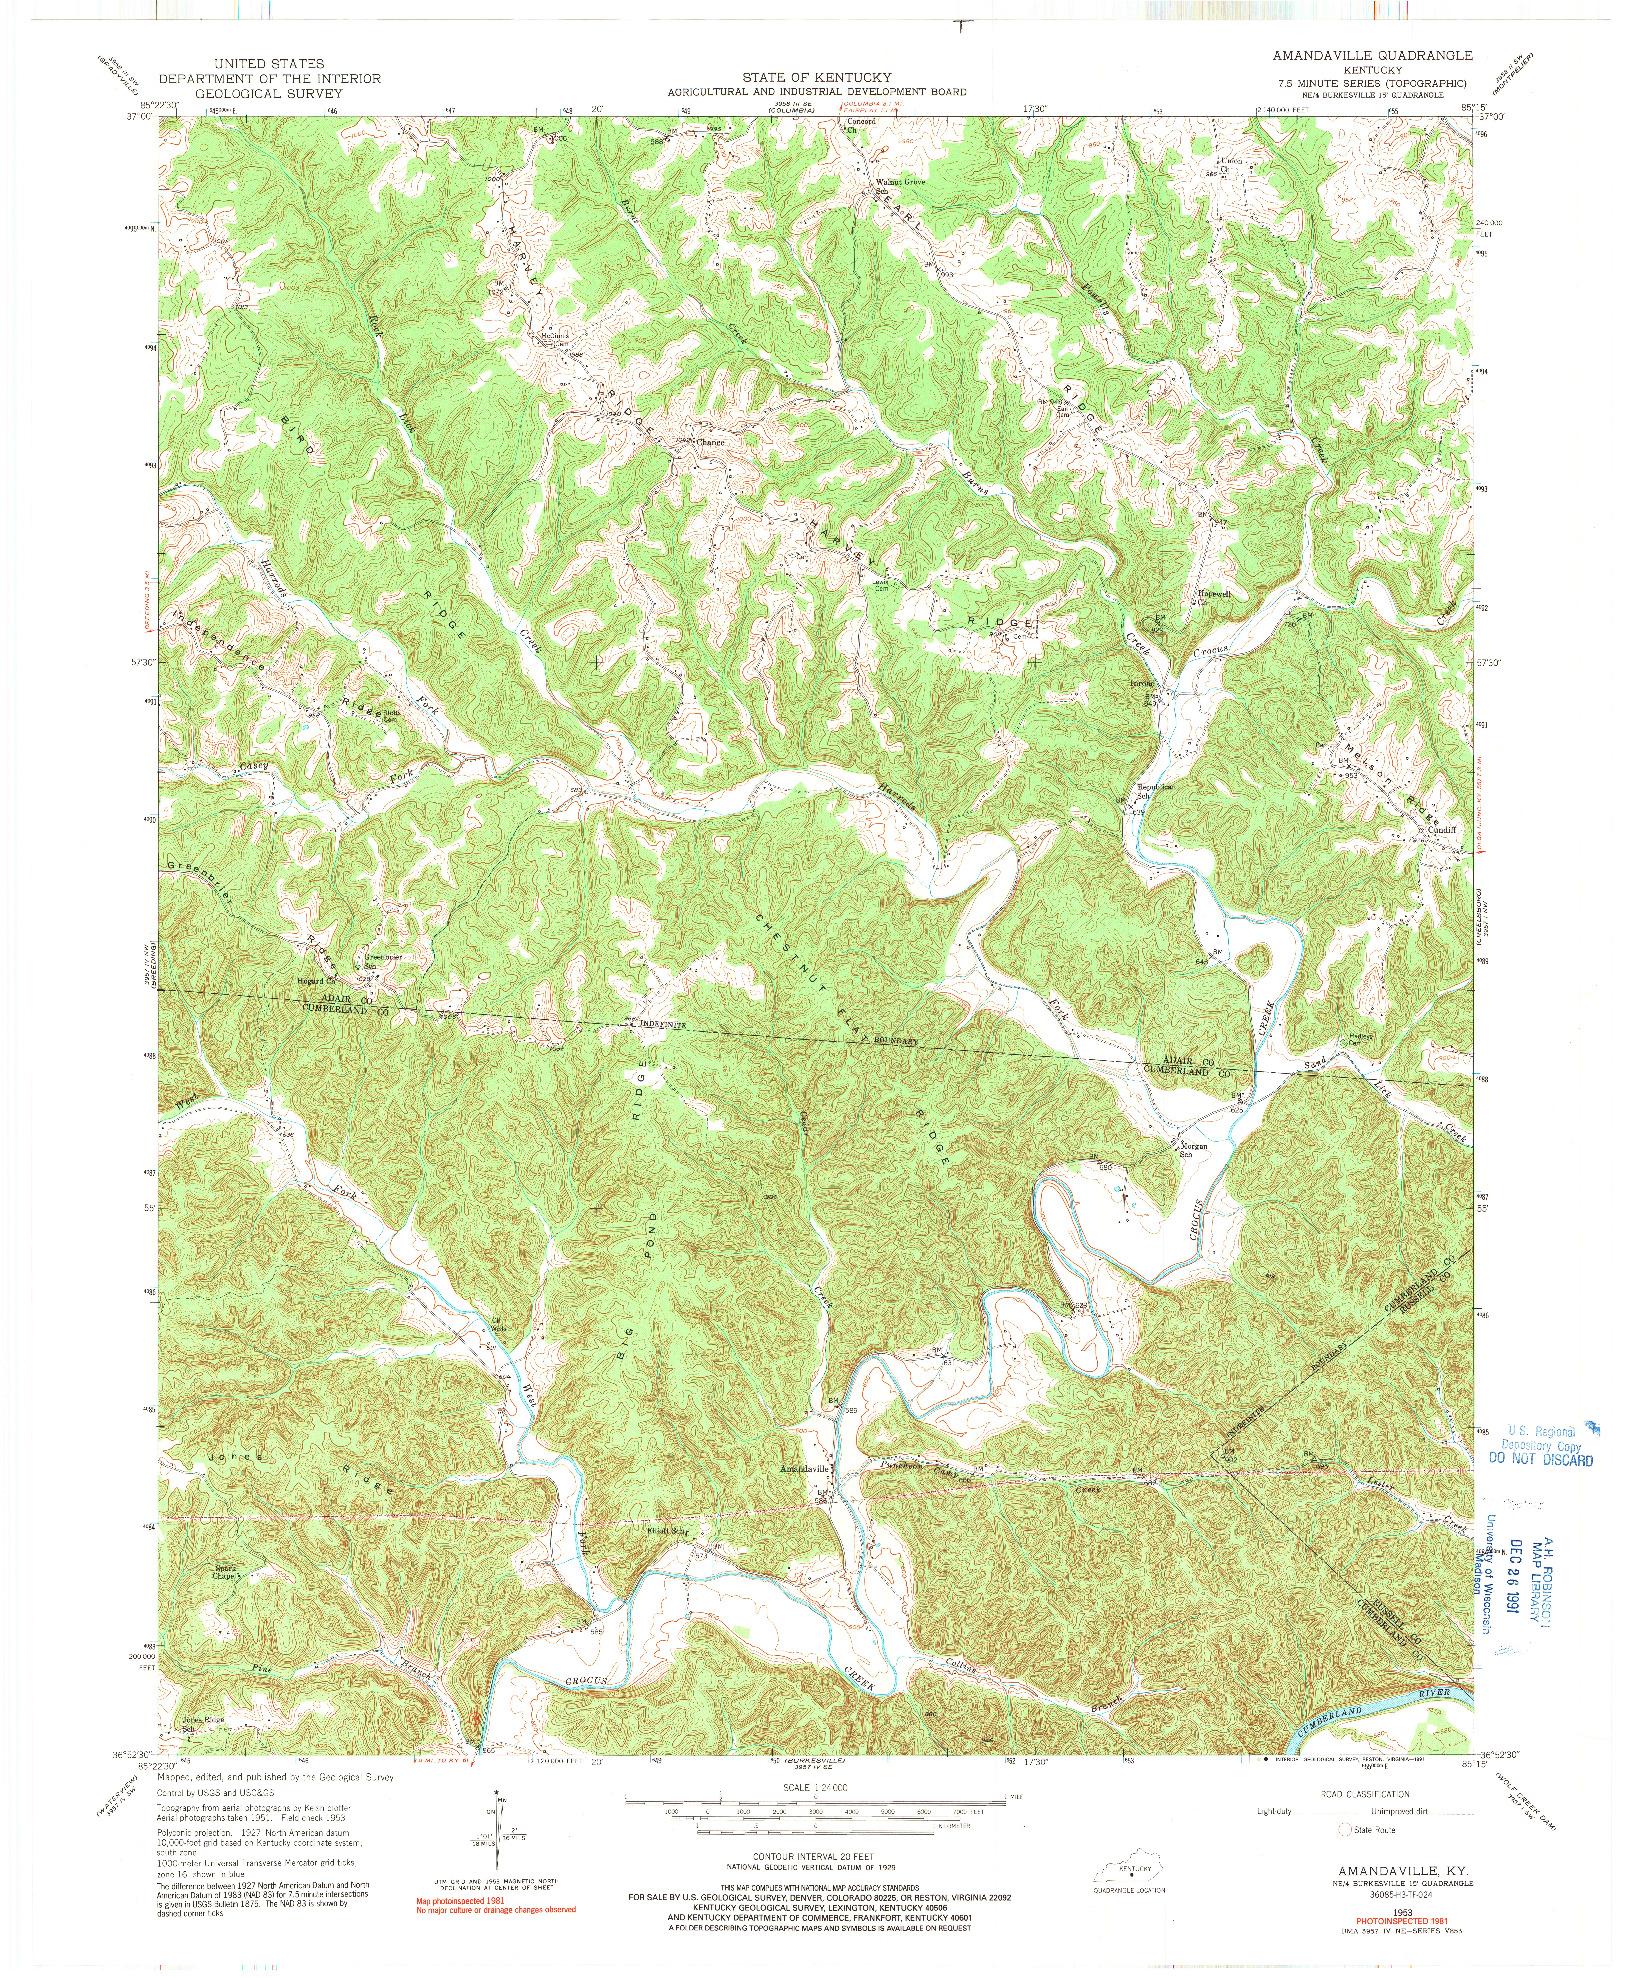 USGS 1:24000-SCALE QUADRANGLE FOR AMANDAVILLE, KY 1953